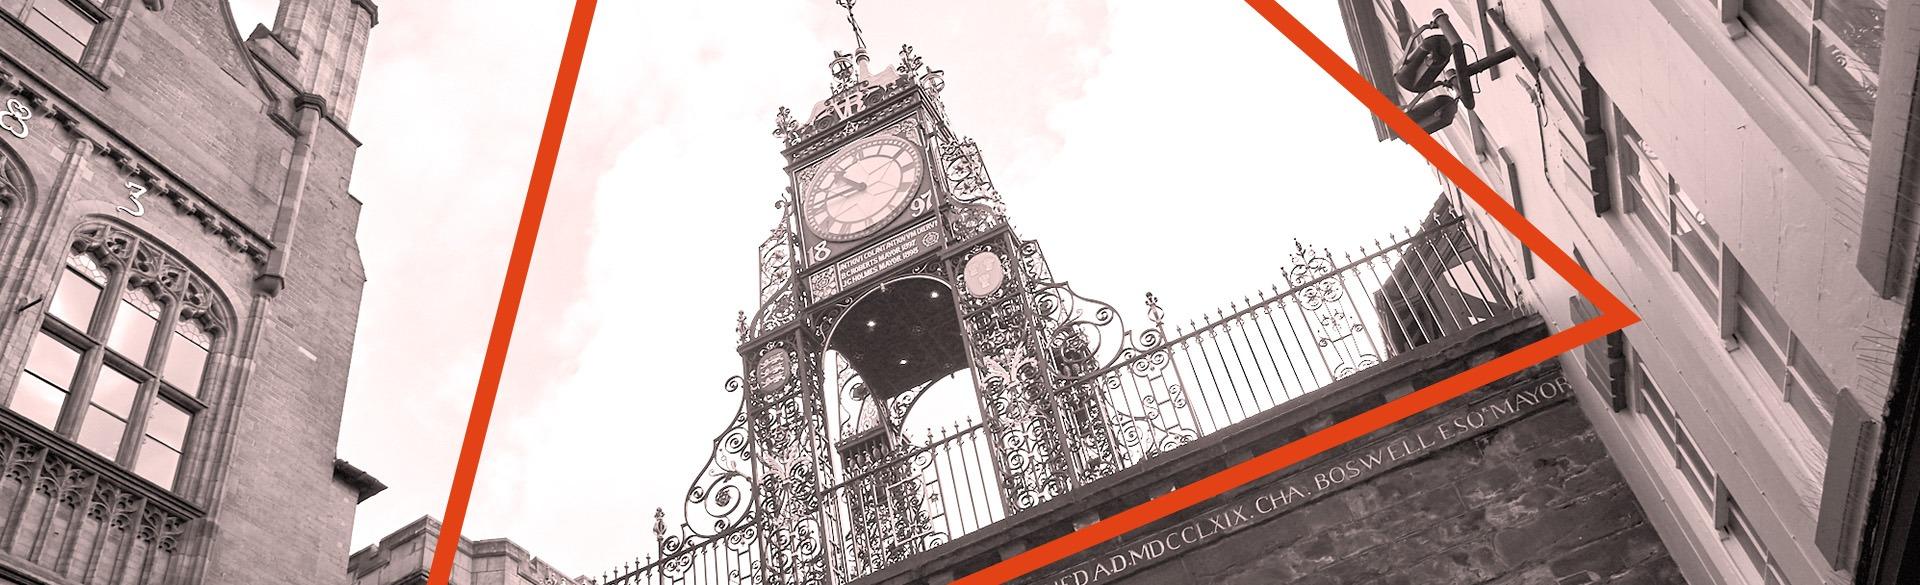 Chester, City Centre